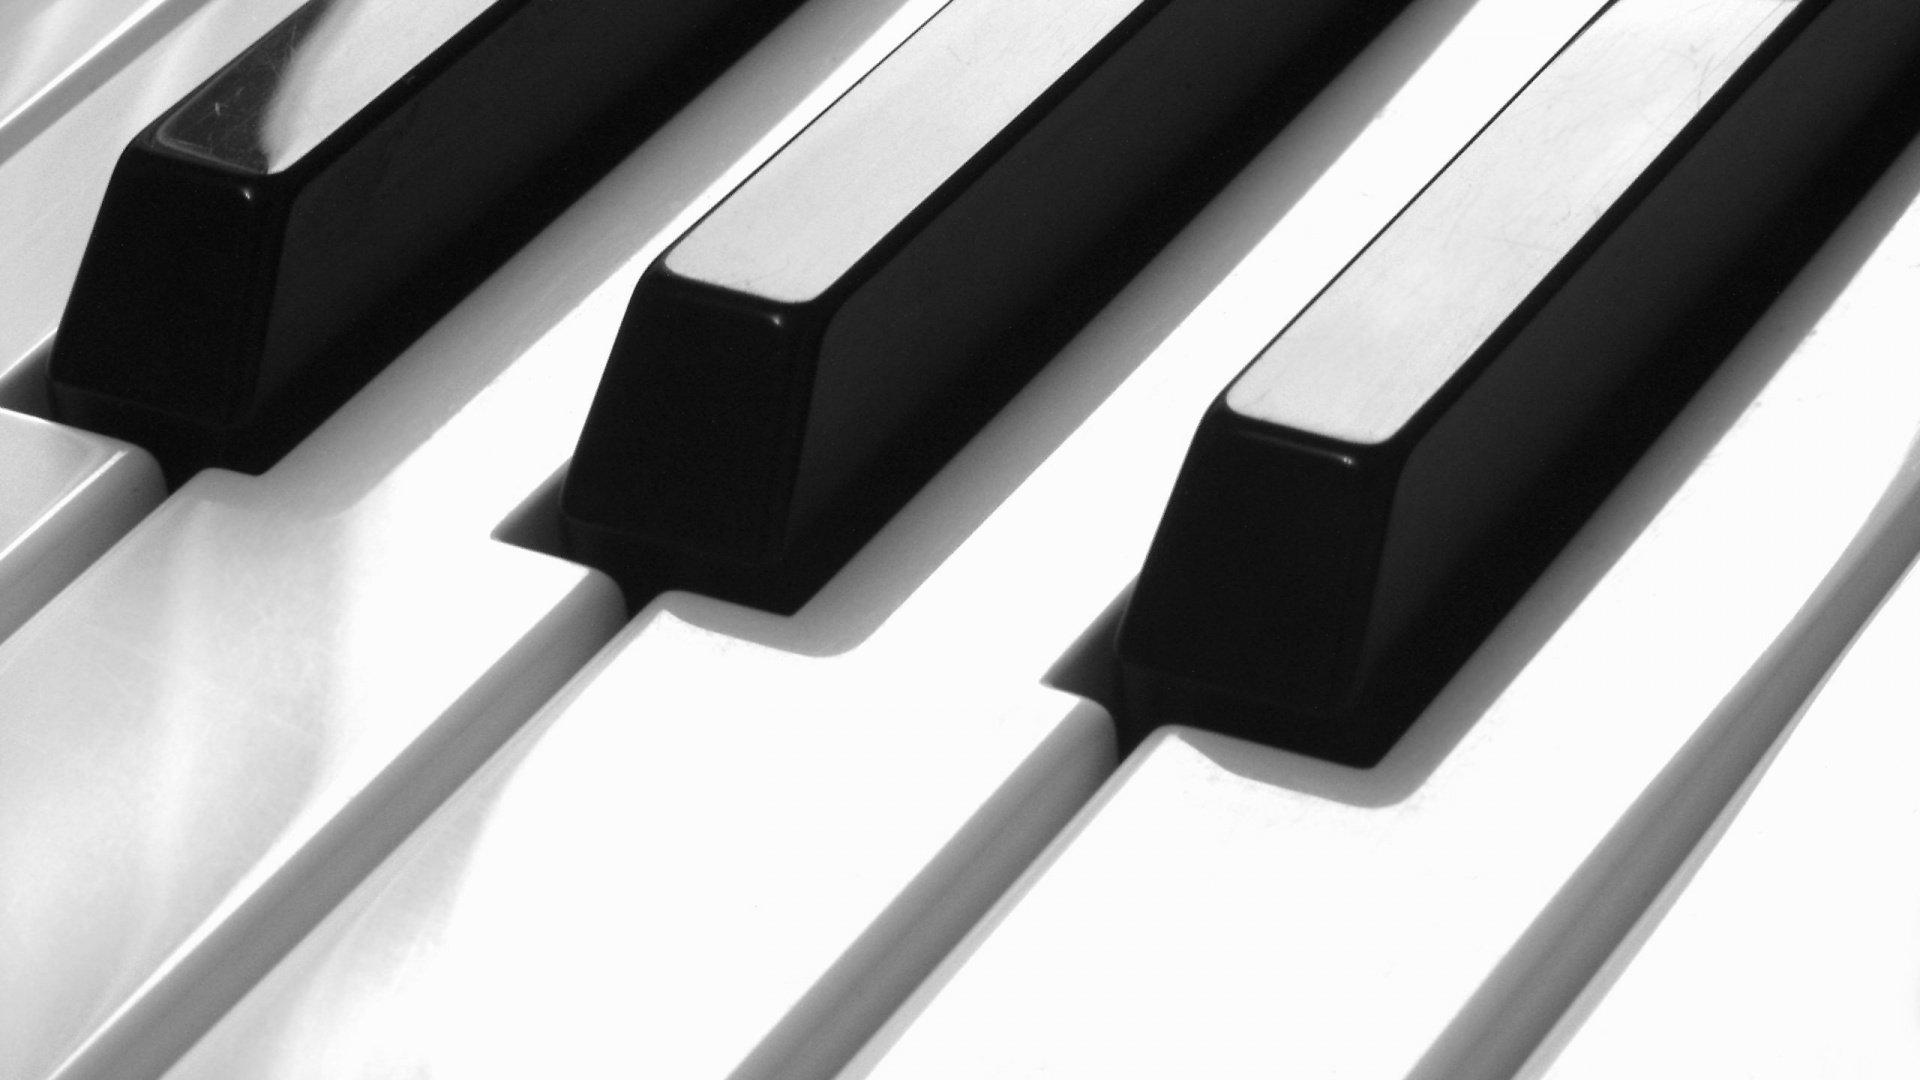 Piano Keys Hd Wallpaper